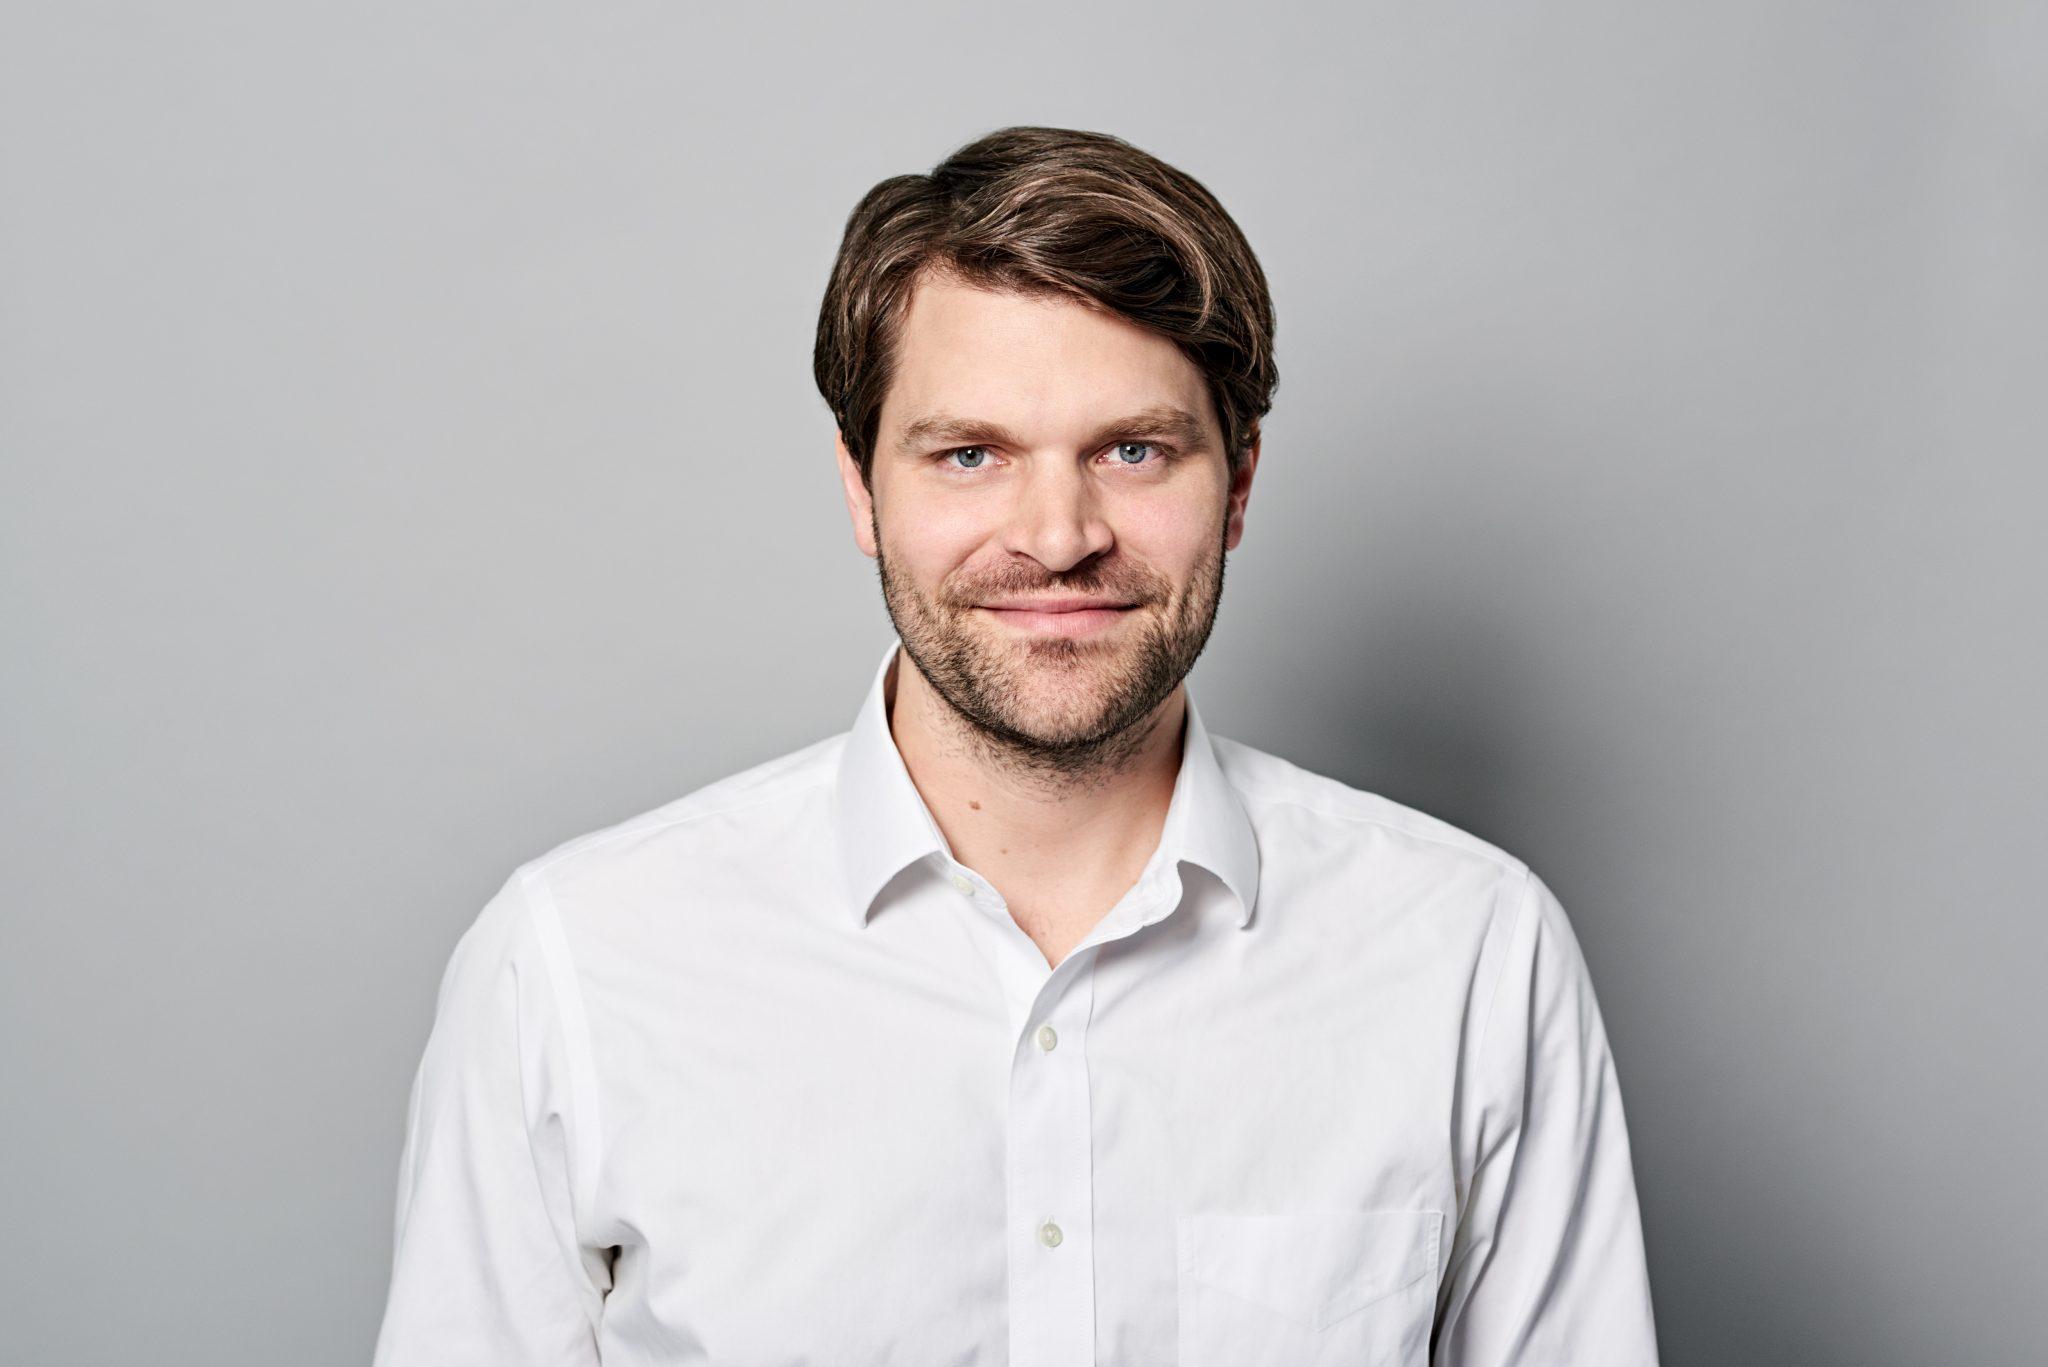 Photo of Anton Waitz investor at Project A.